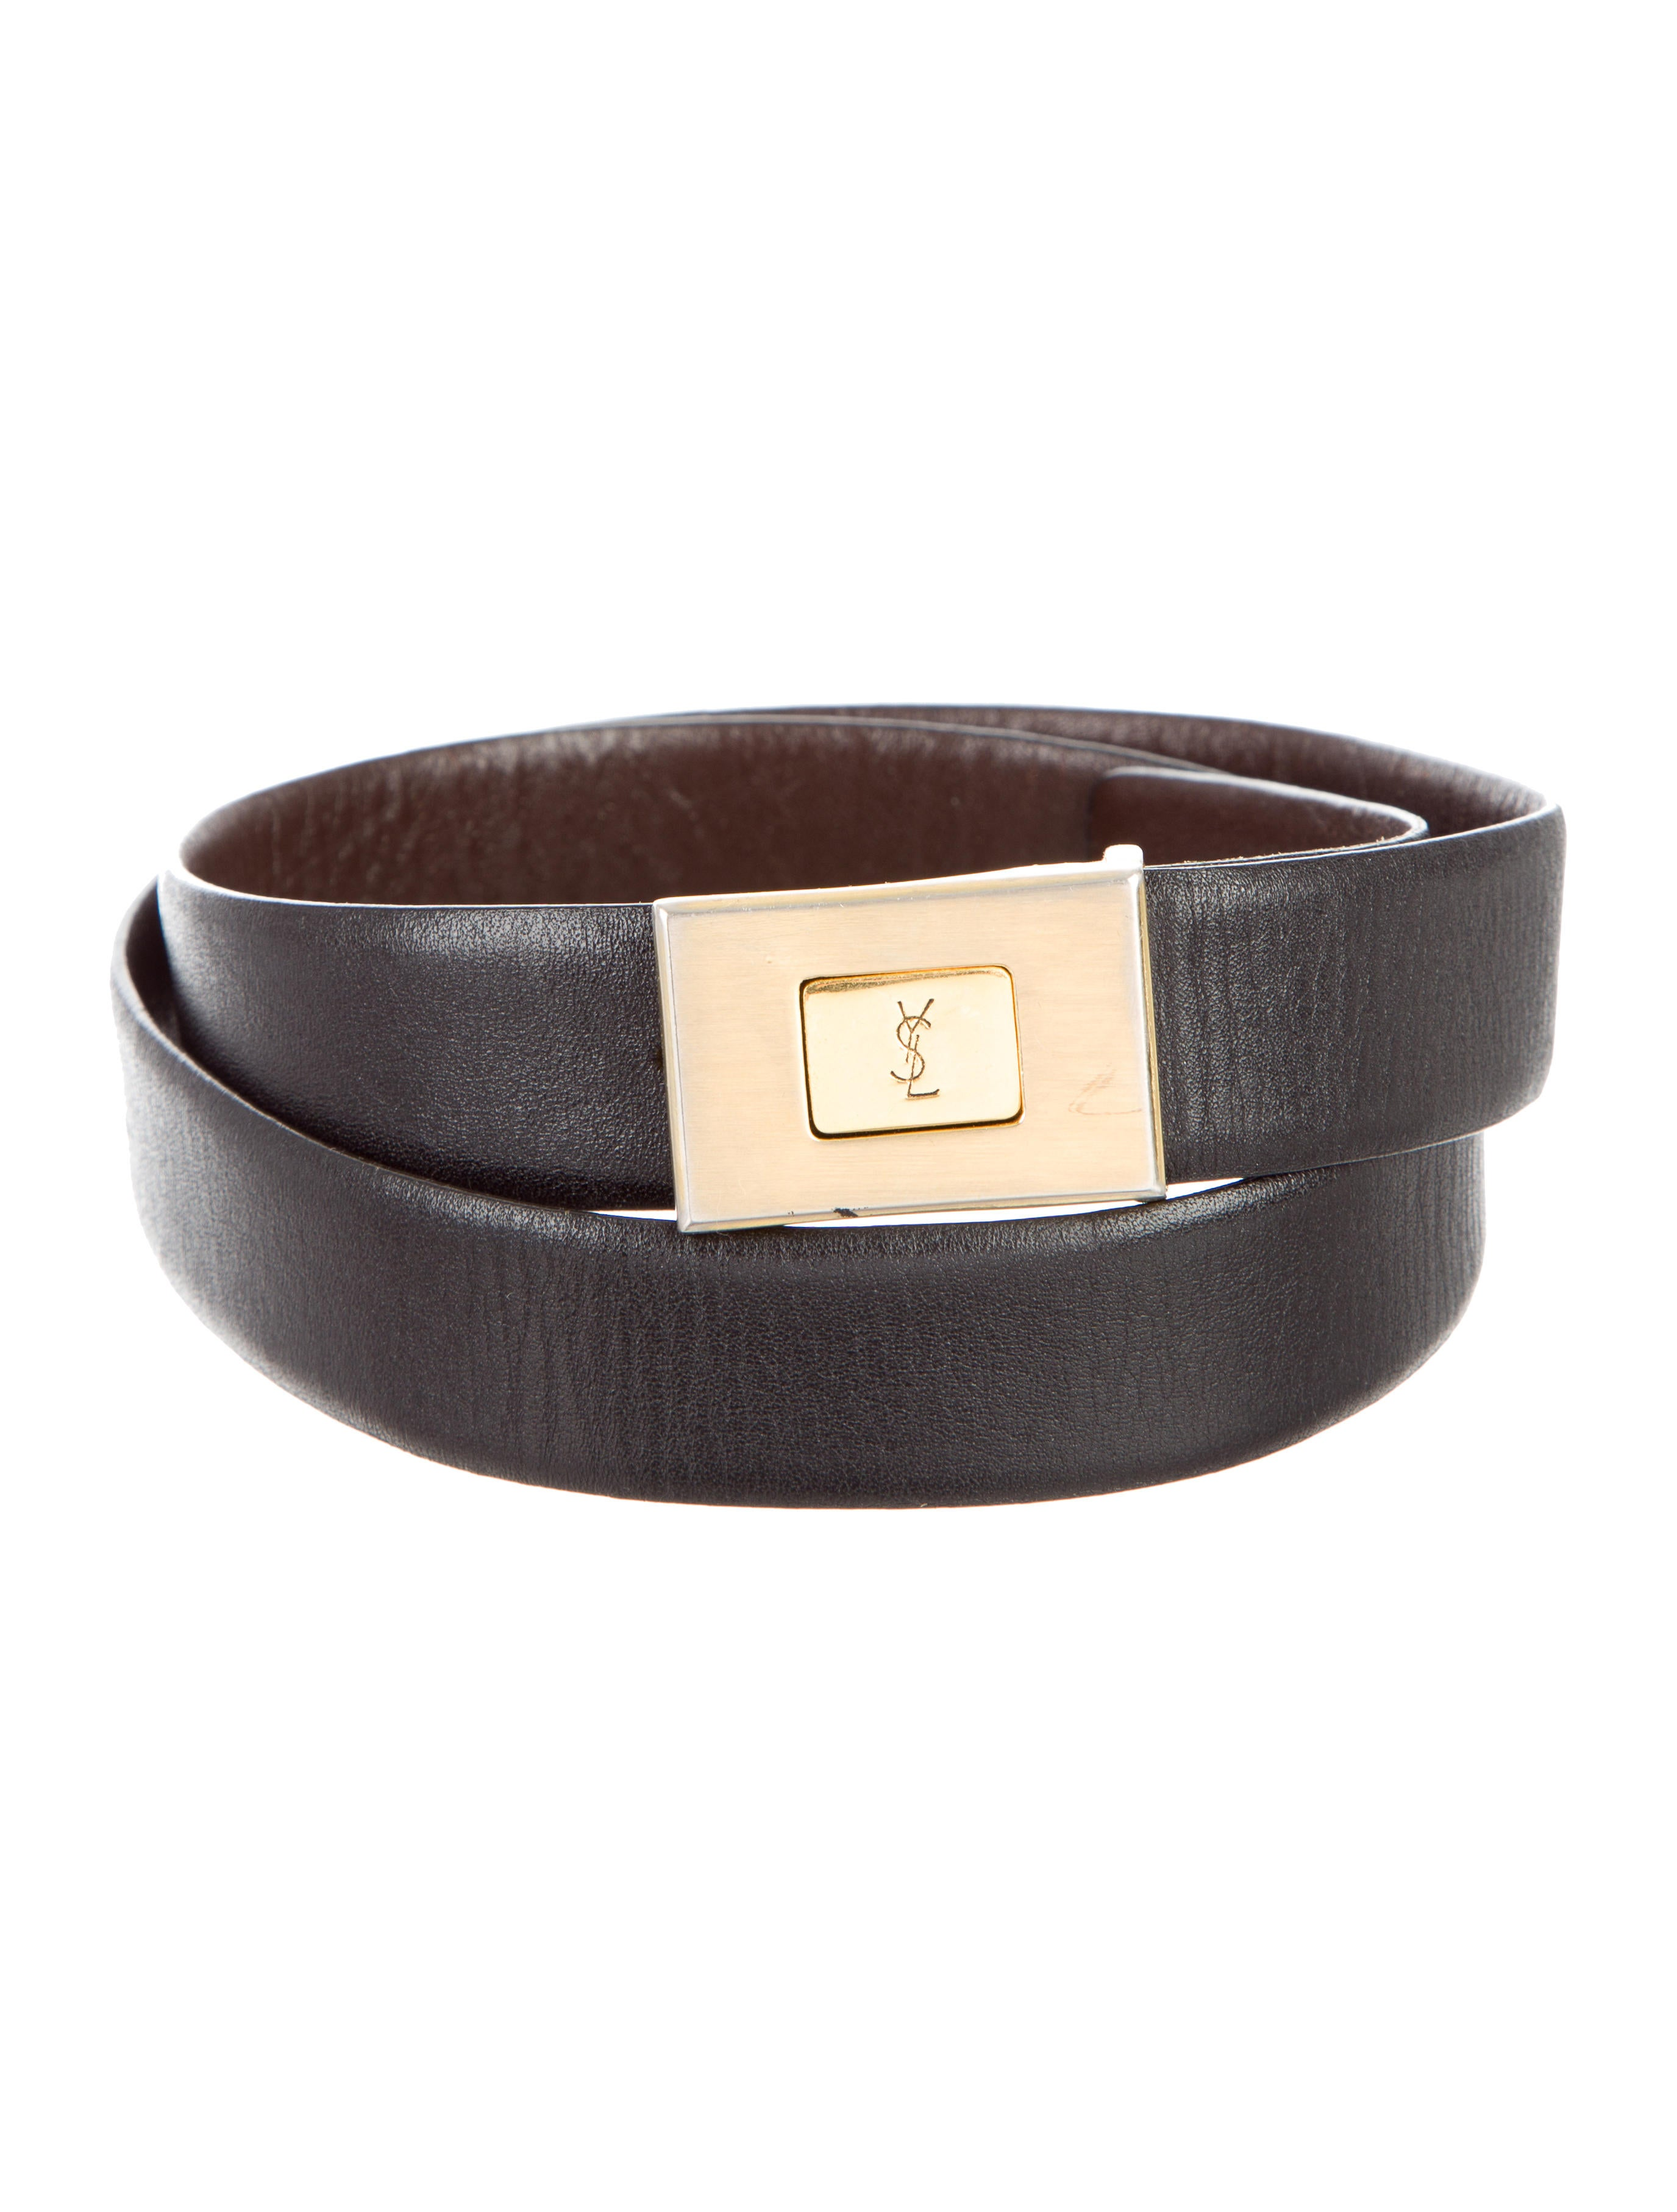 yves laurent logo leather belt accessories